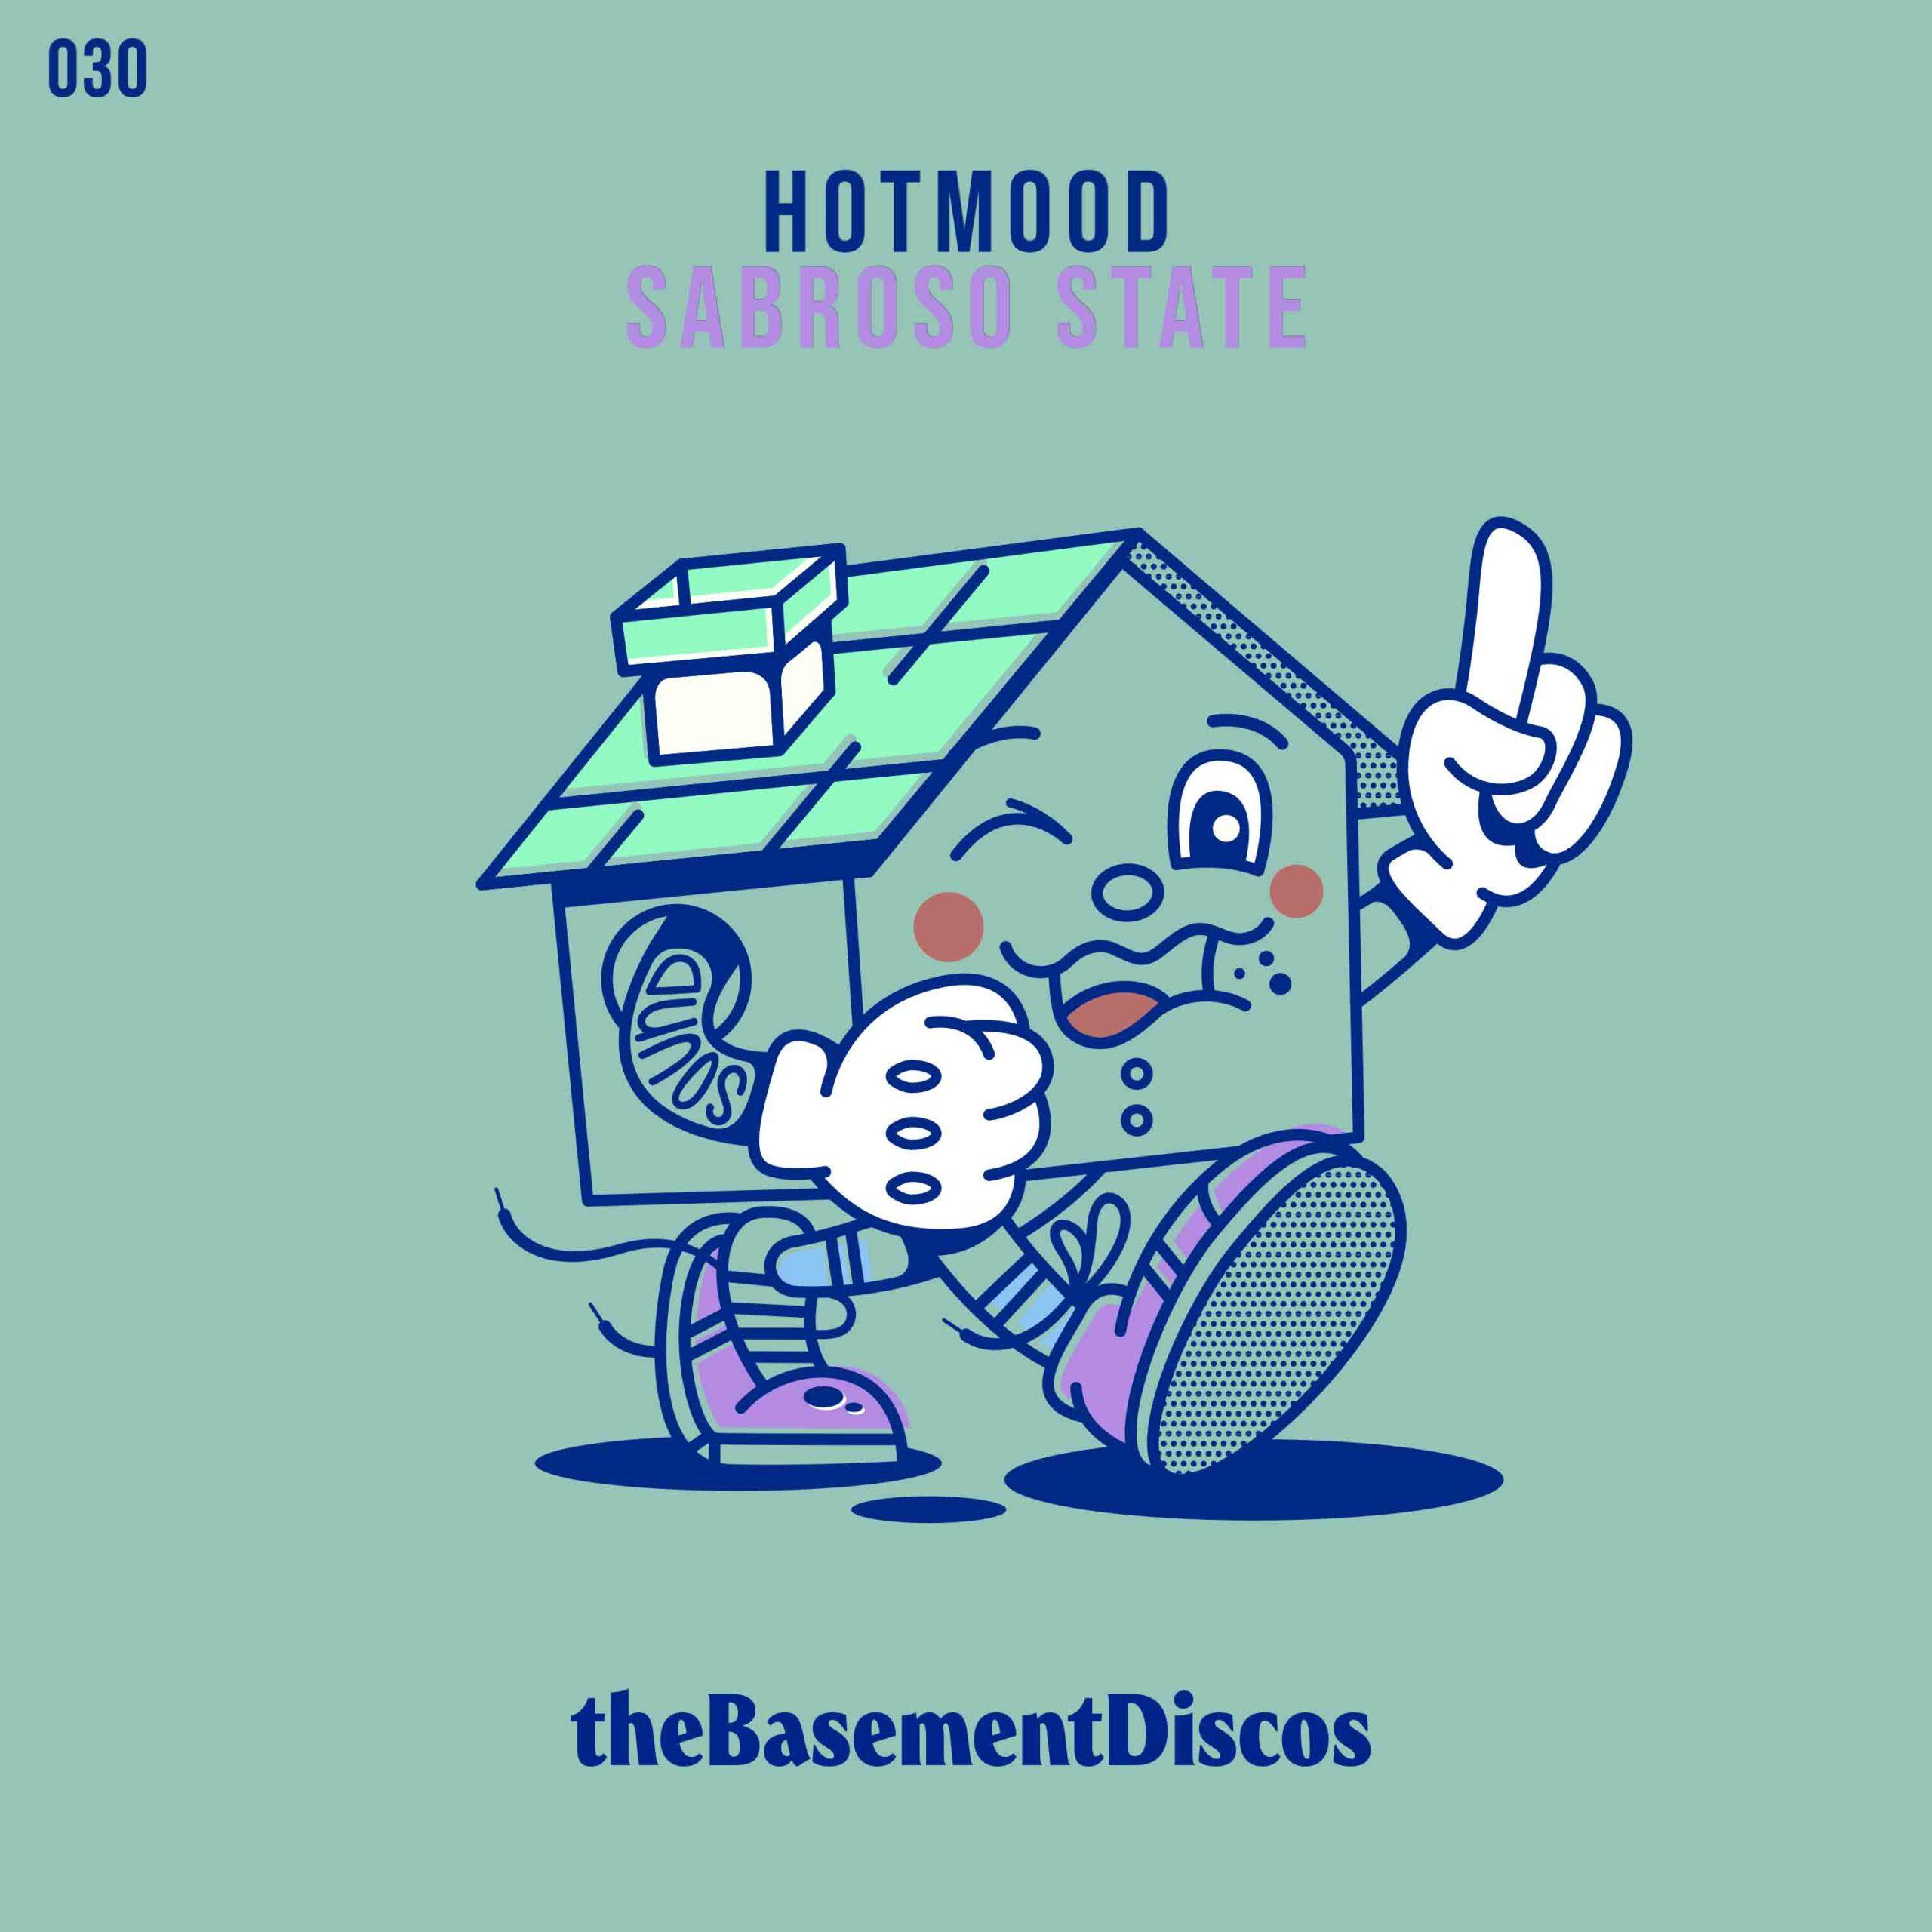 the-basement-thebasement-thebasementdiscos-hotmood-sabroso-state-valencia-dj-disco-house-good-feelings-portada